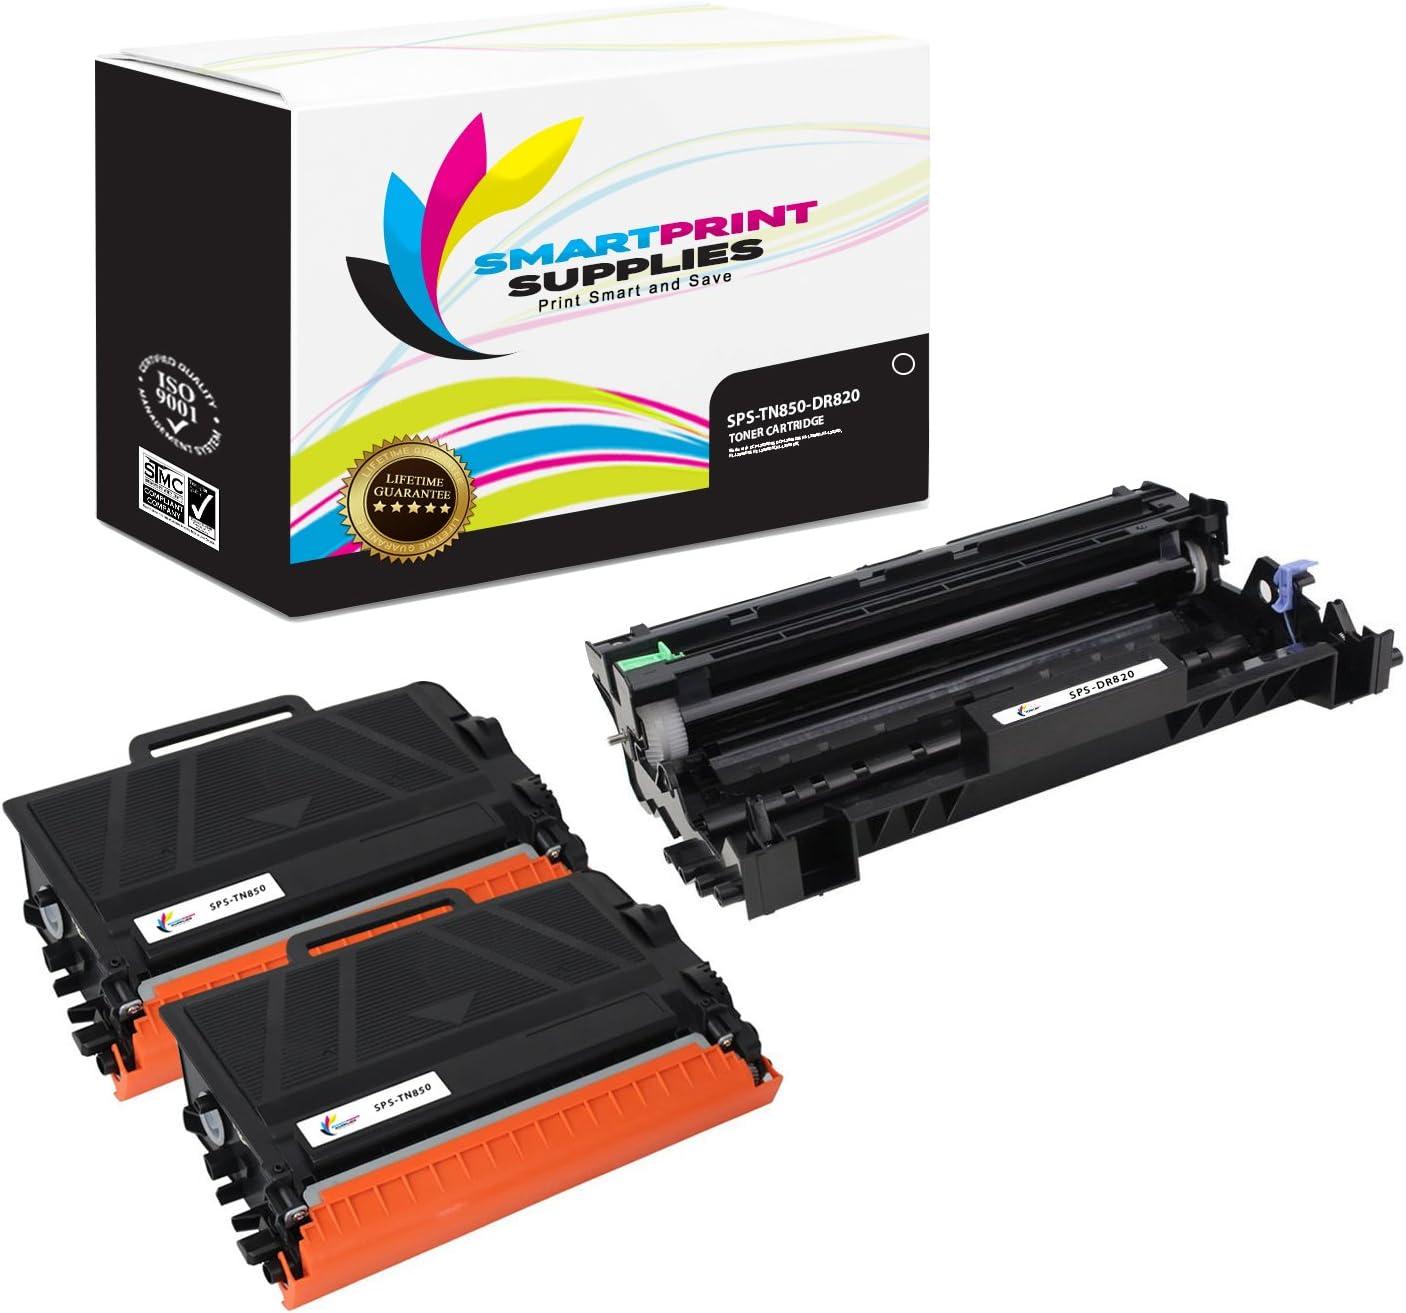 2 Toner,1 Drum DR-820 SuppliesOutlet Compatible Toner Cartridge and Drum Unit Set for Brother TN850 TN-850 DR820